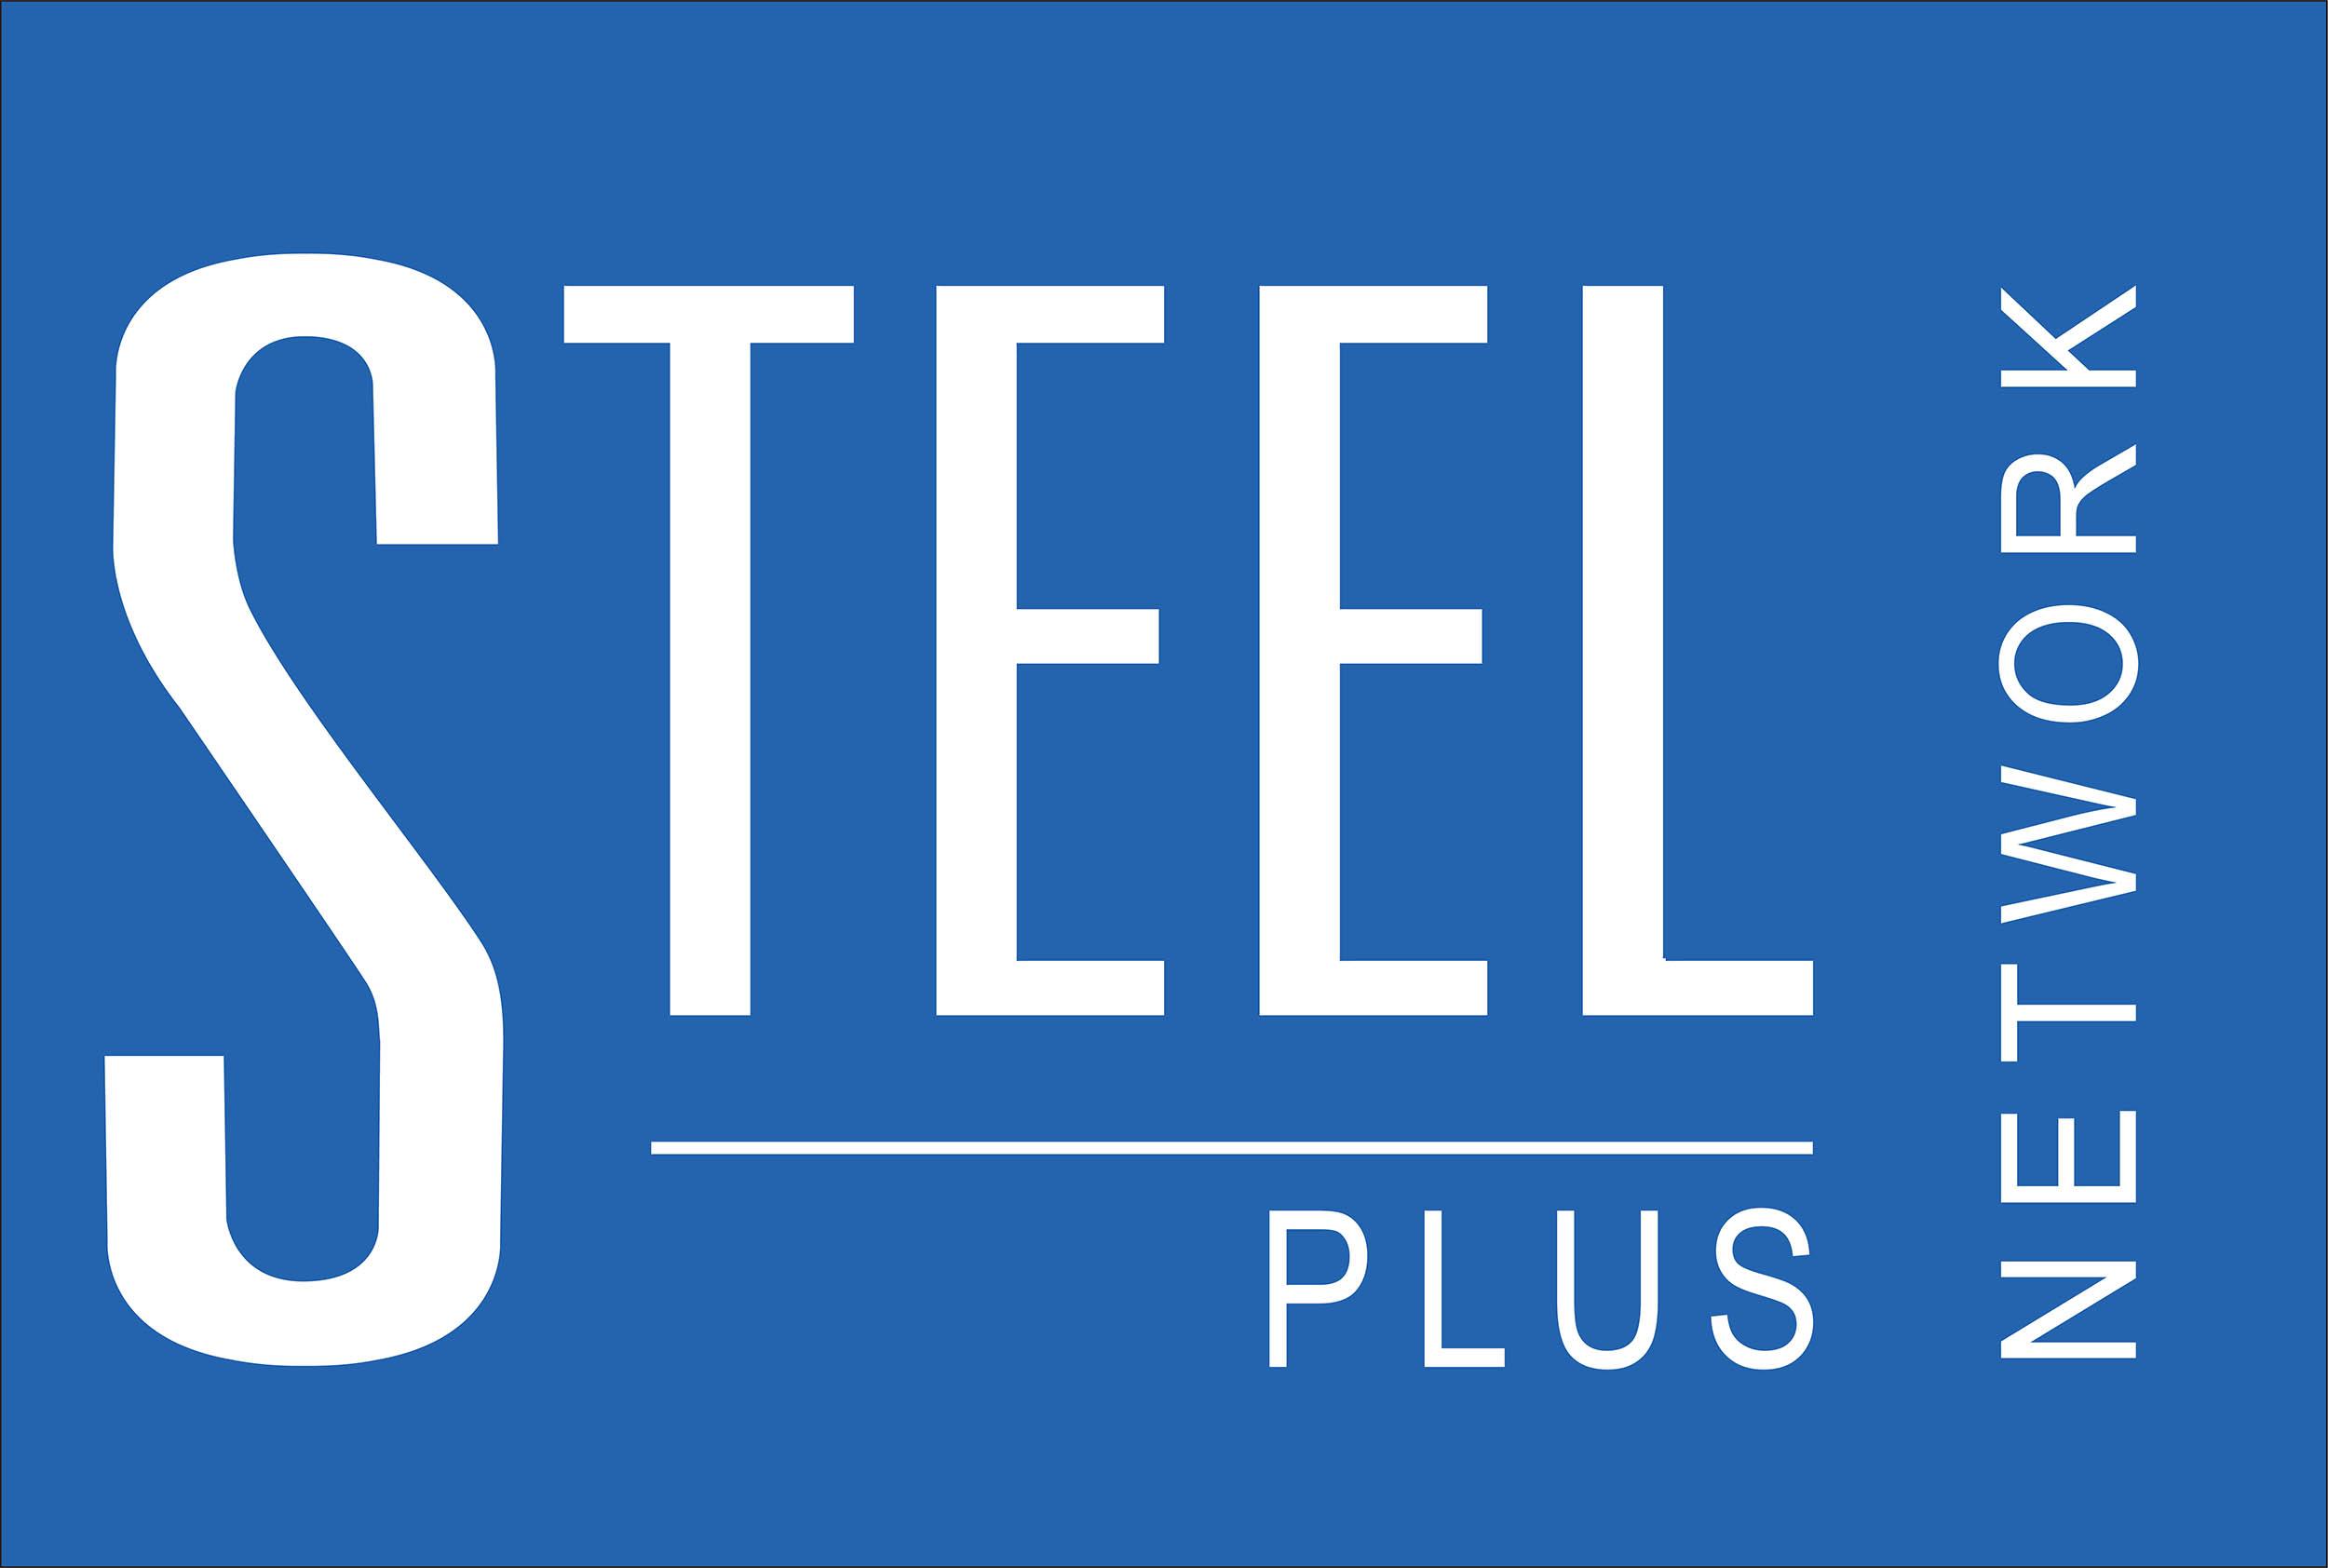 SteelPlus_Logo_ENG_noINC